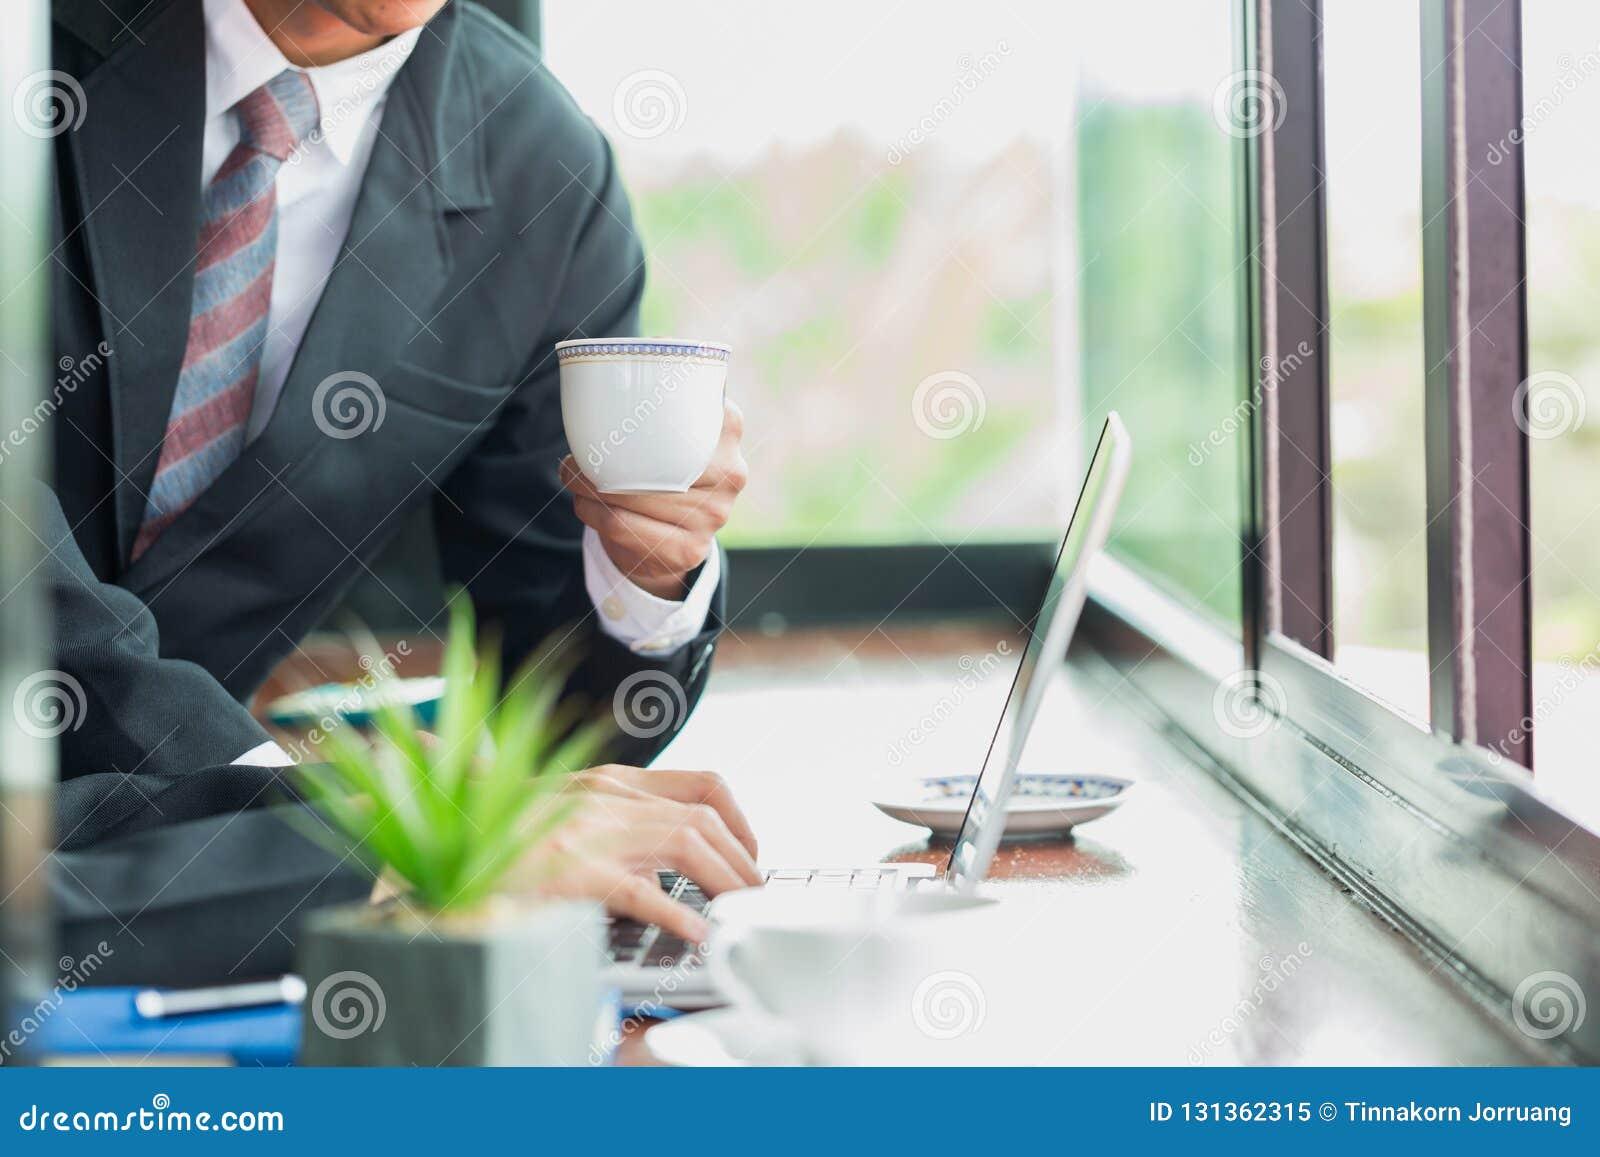 Business man at office desk working together on a laptop, teamwork concept